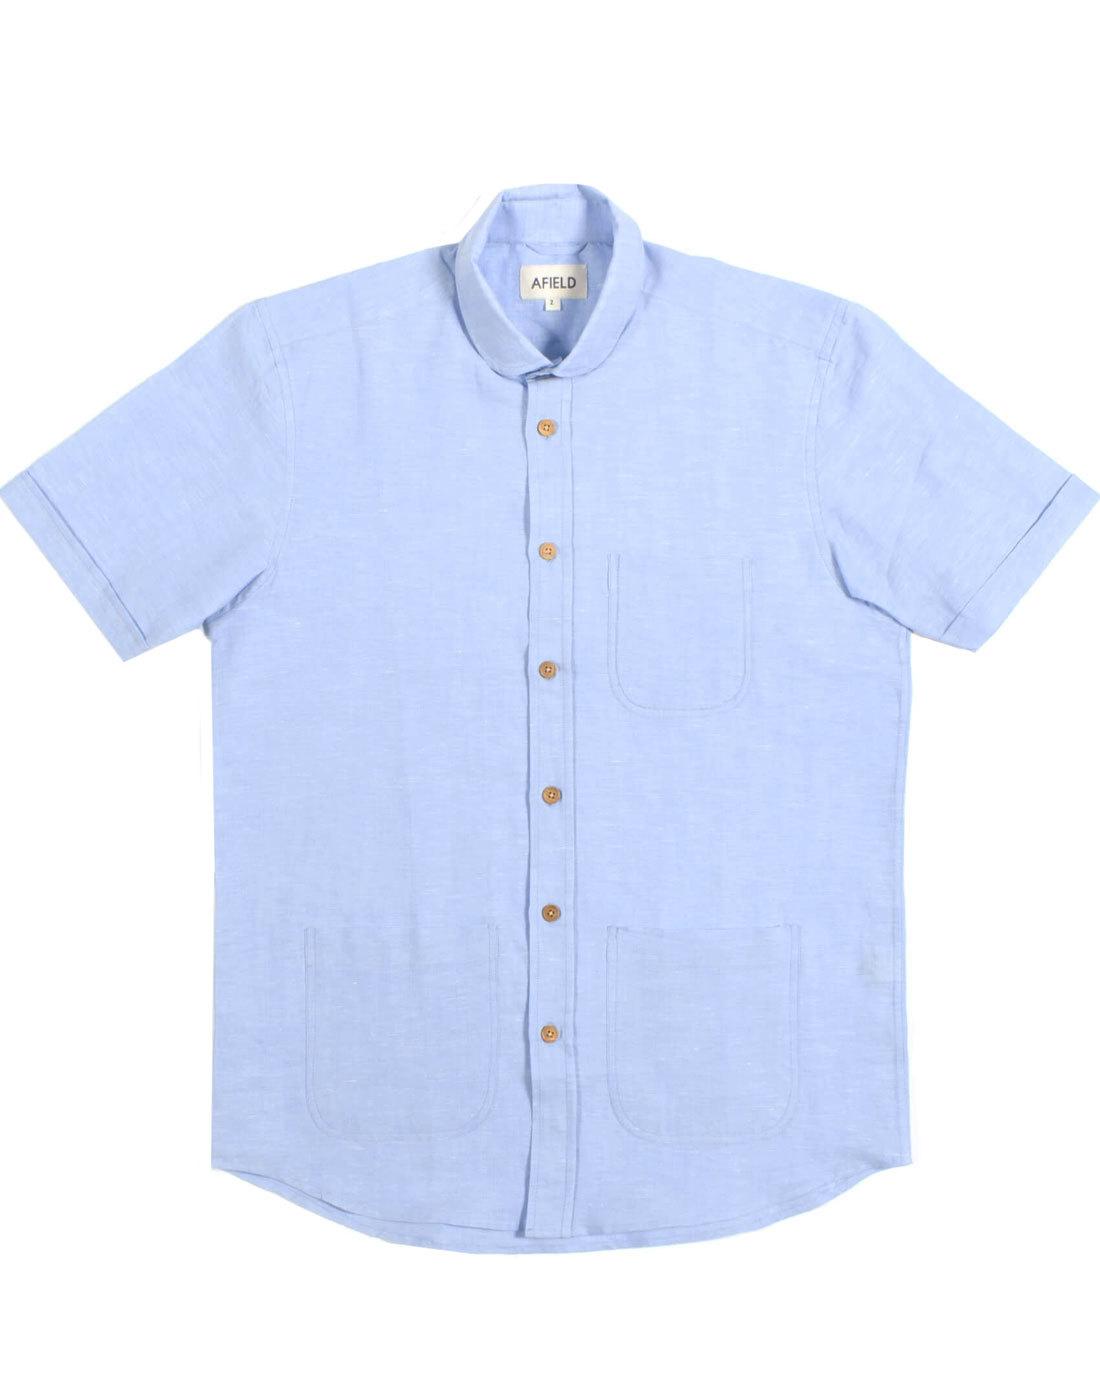 Santos AFIELD Retro Linen Penny Collar Shirt BLUE